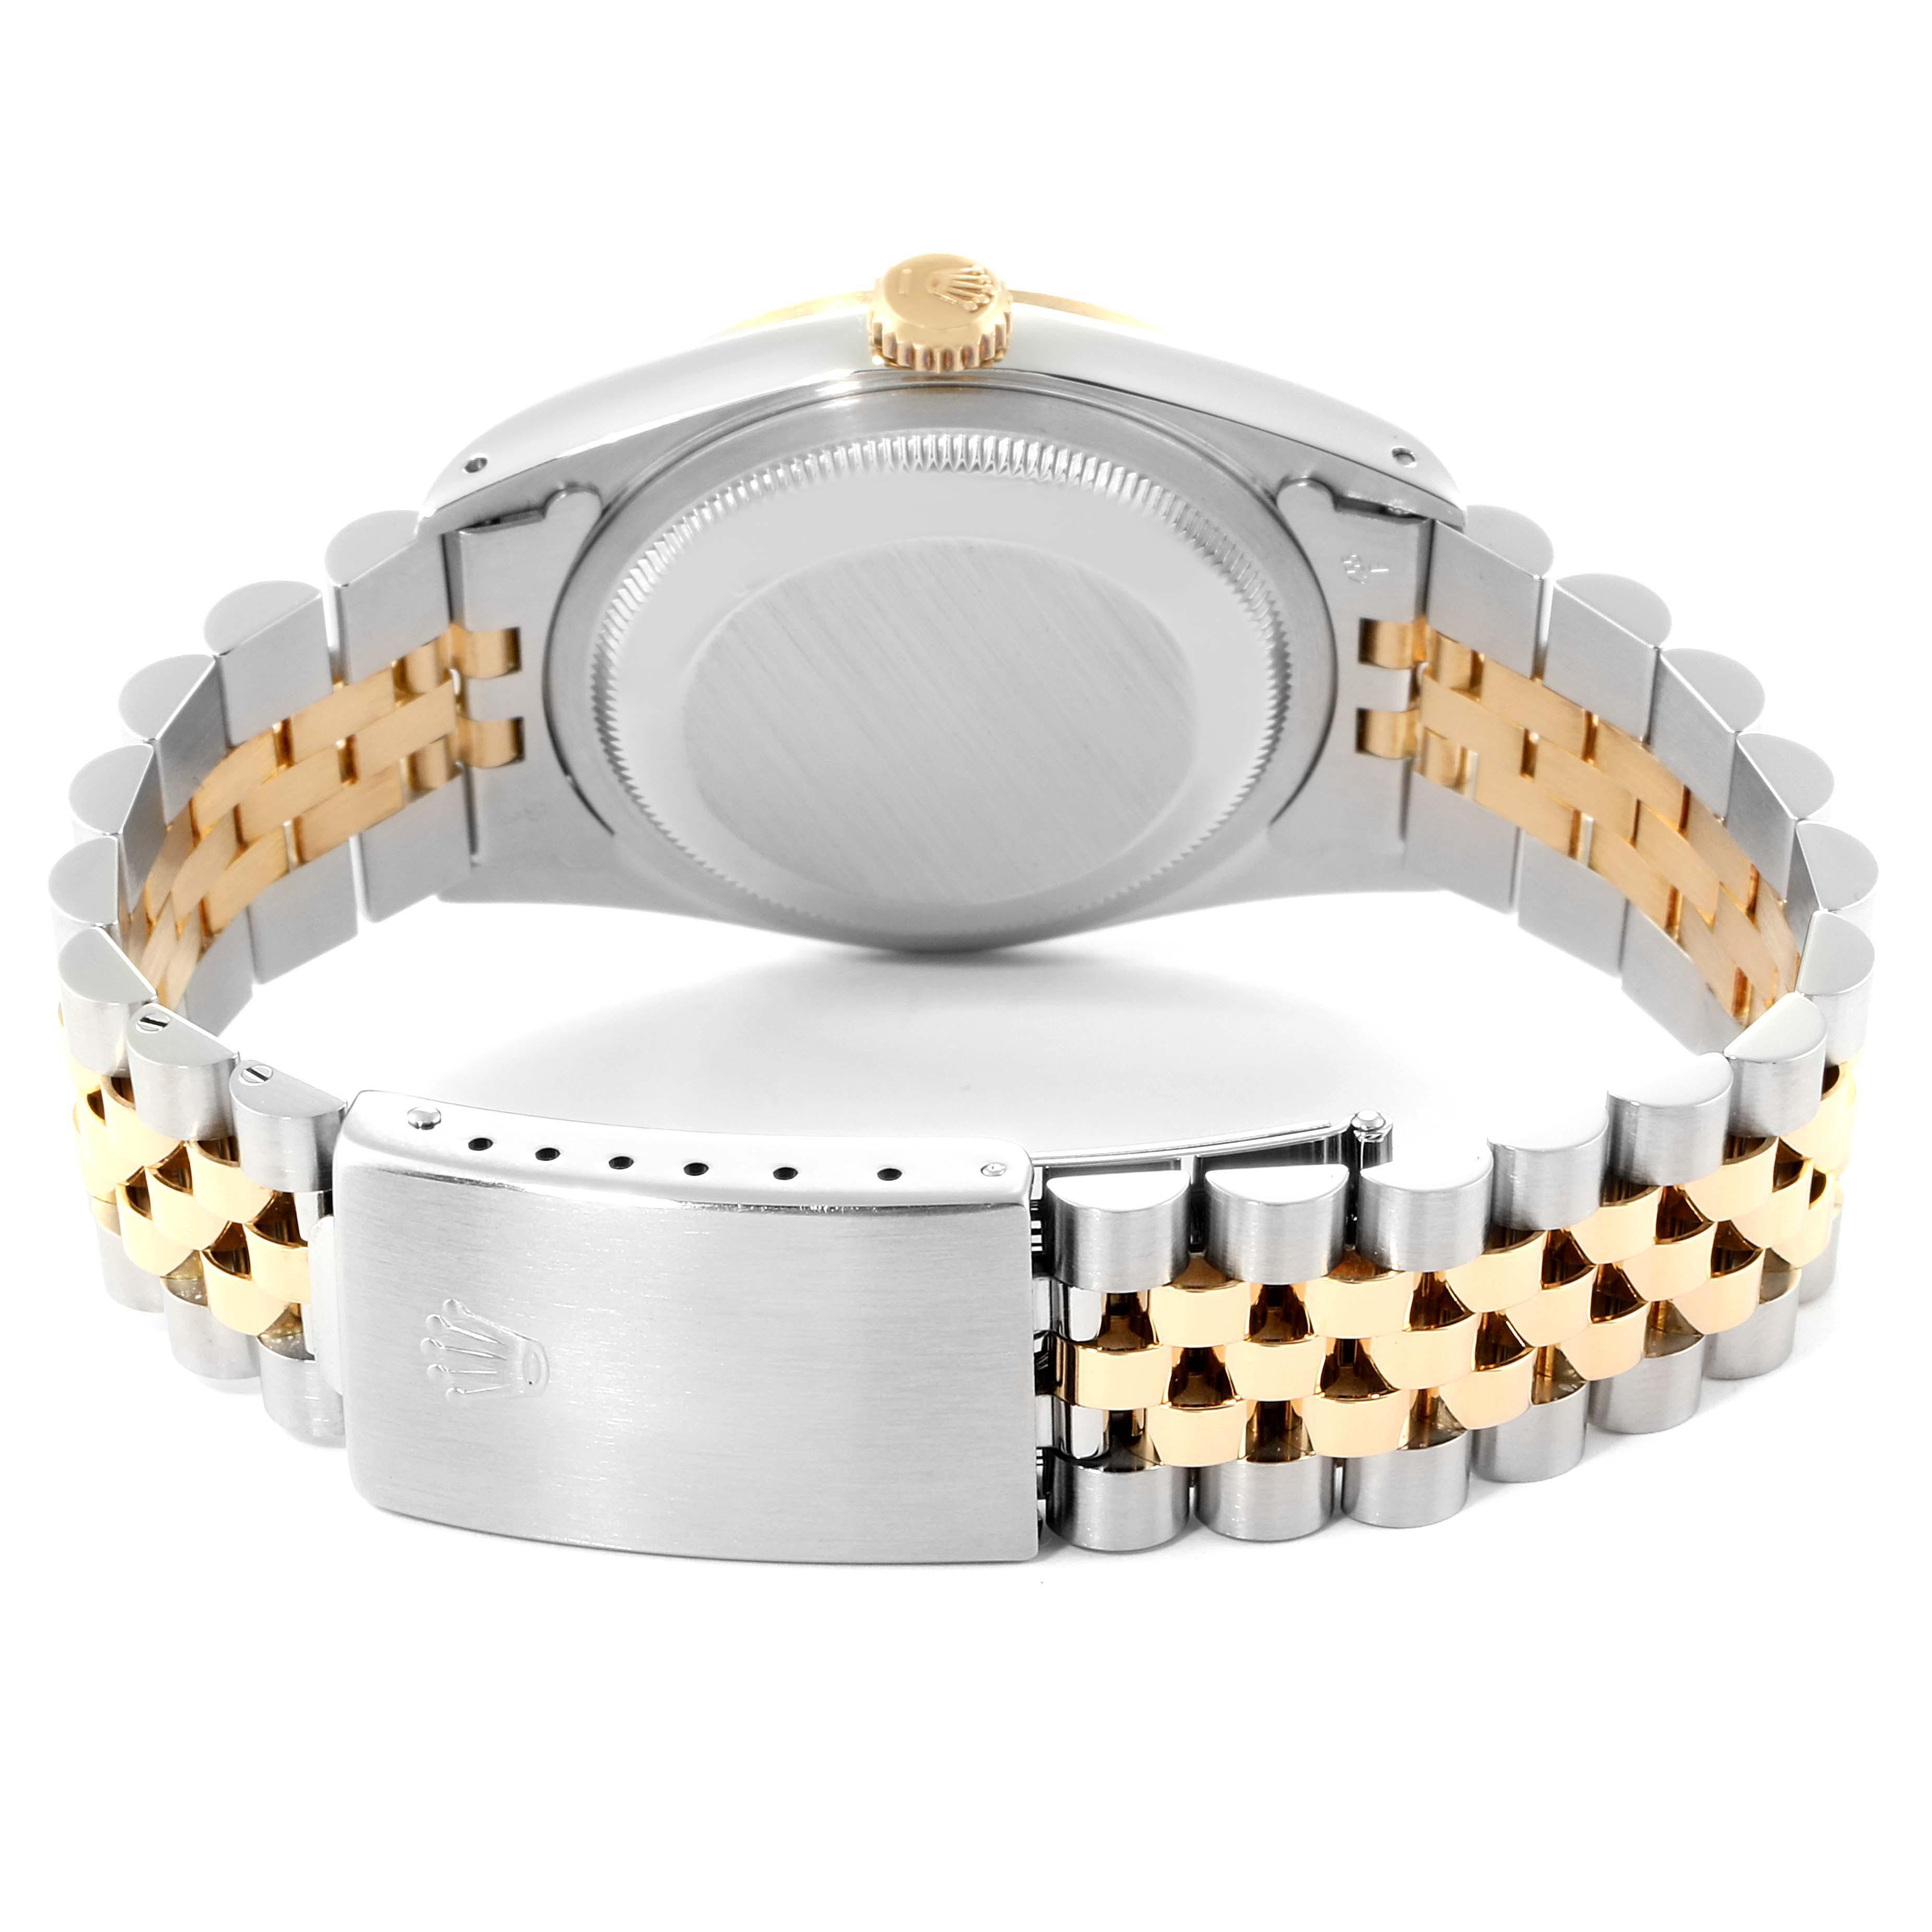 Rolex Datejust Steel Yellow Gold Black Dial Mens Watch 16233 Box SwissWatchExpo